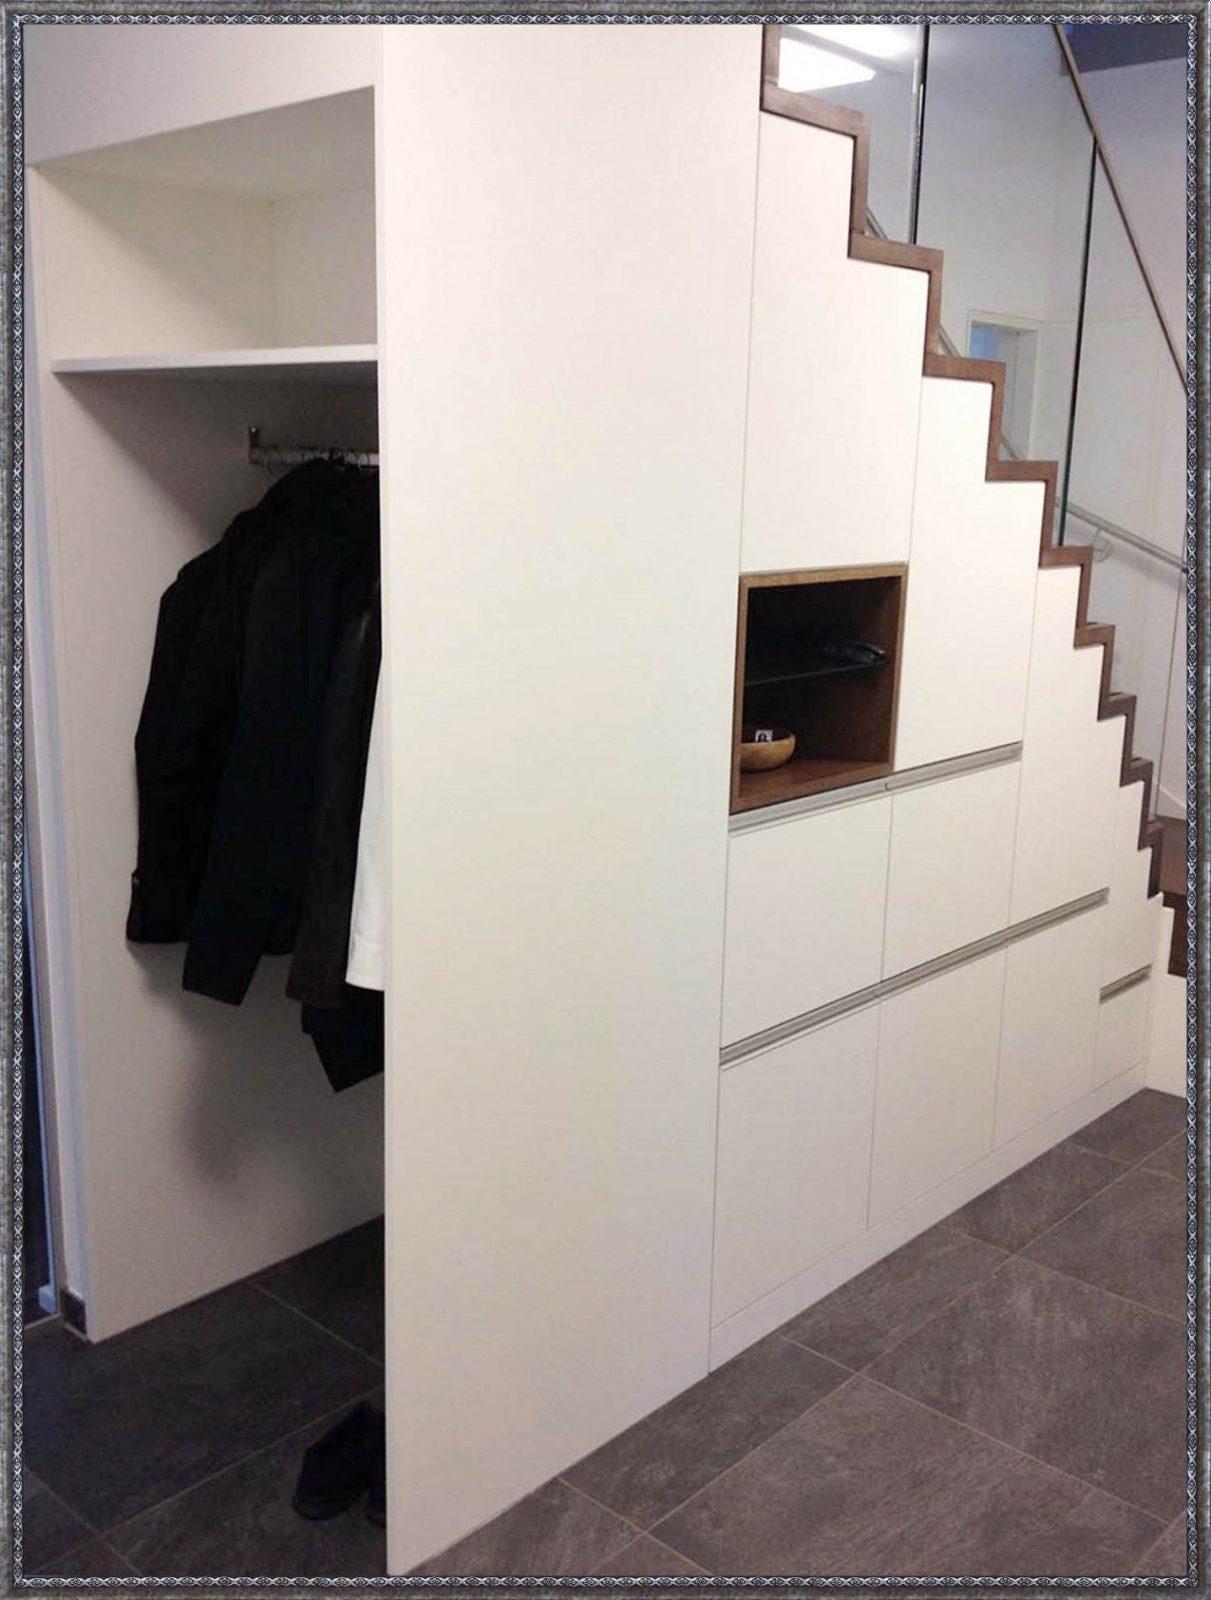 Schrank Unter Treppe Ikea Inspirierend Wand Betreffend Schrank Unter von Schrank Unter Treppe Ikea Bild